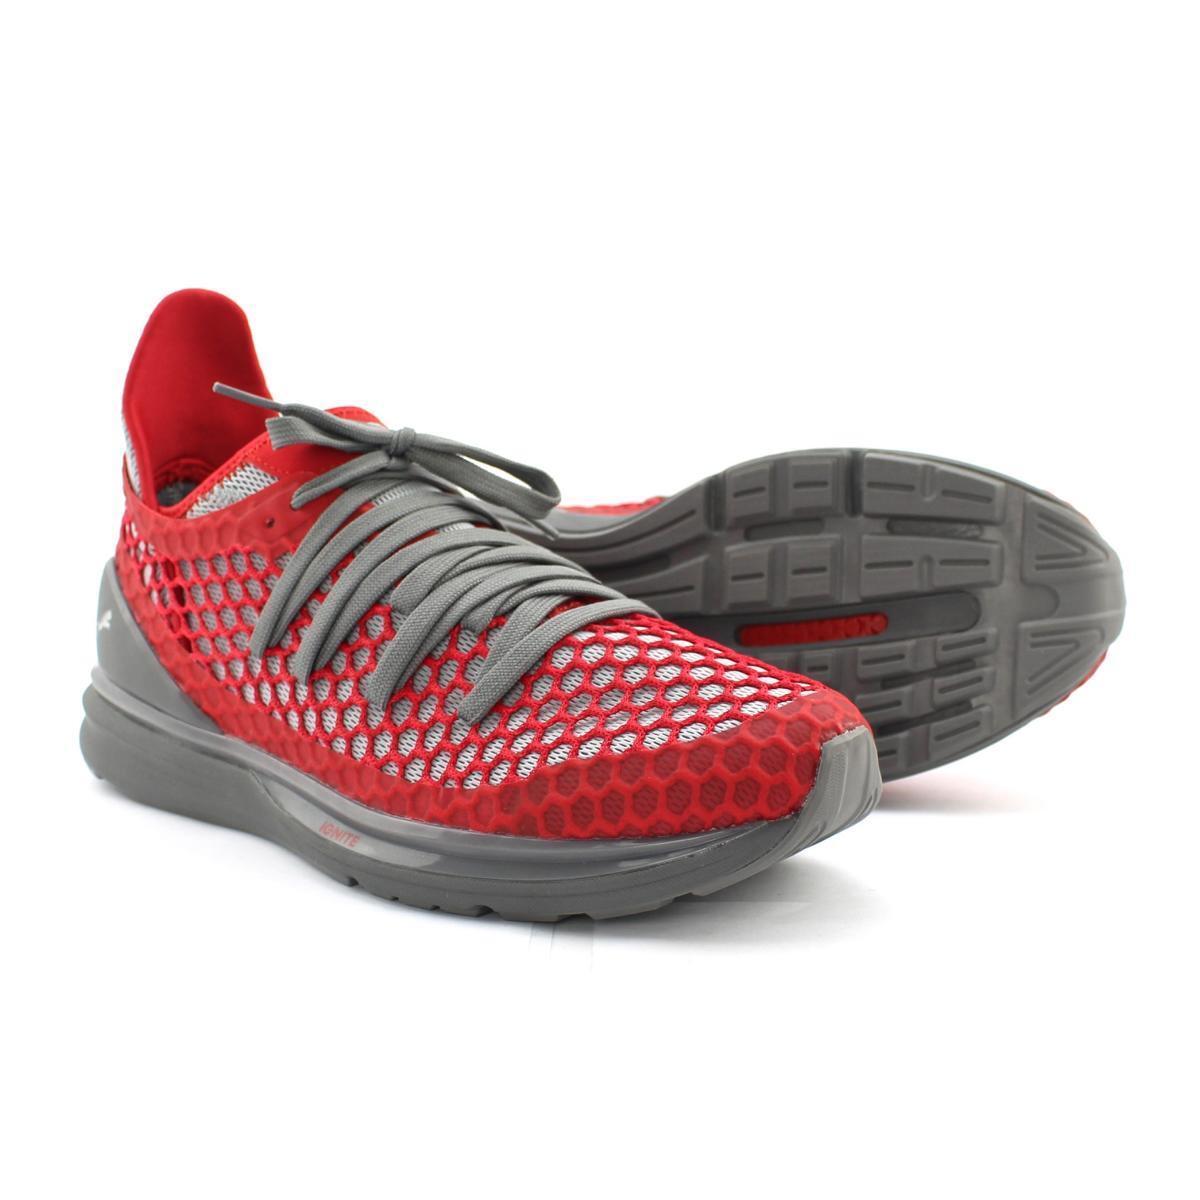 Puma Ignite Limitless NETFIT 189983 02 Sport Running Turnschuhe Schuhe Schuhe Schuhe Laufschuhe 81ecfe